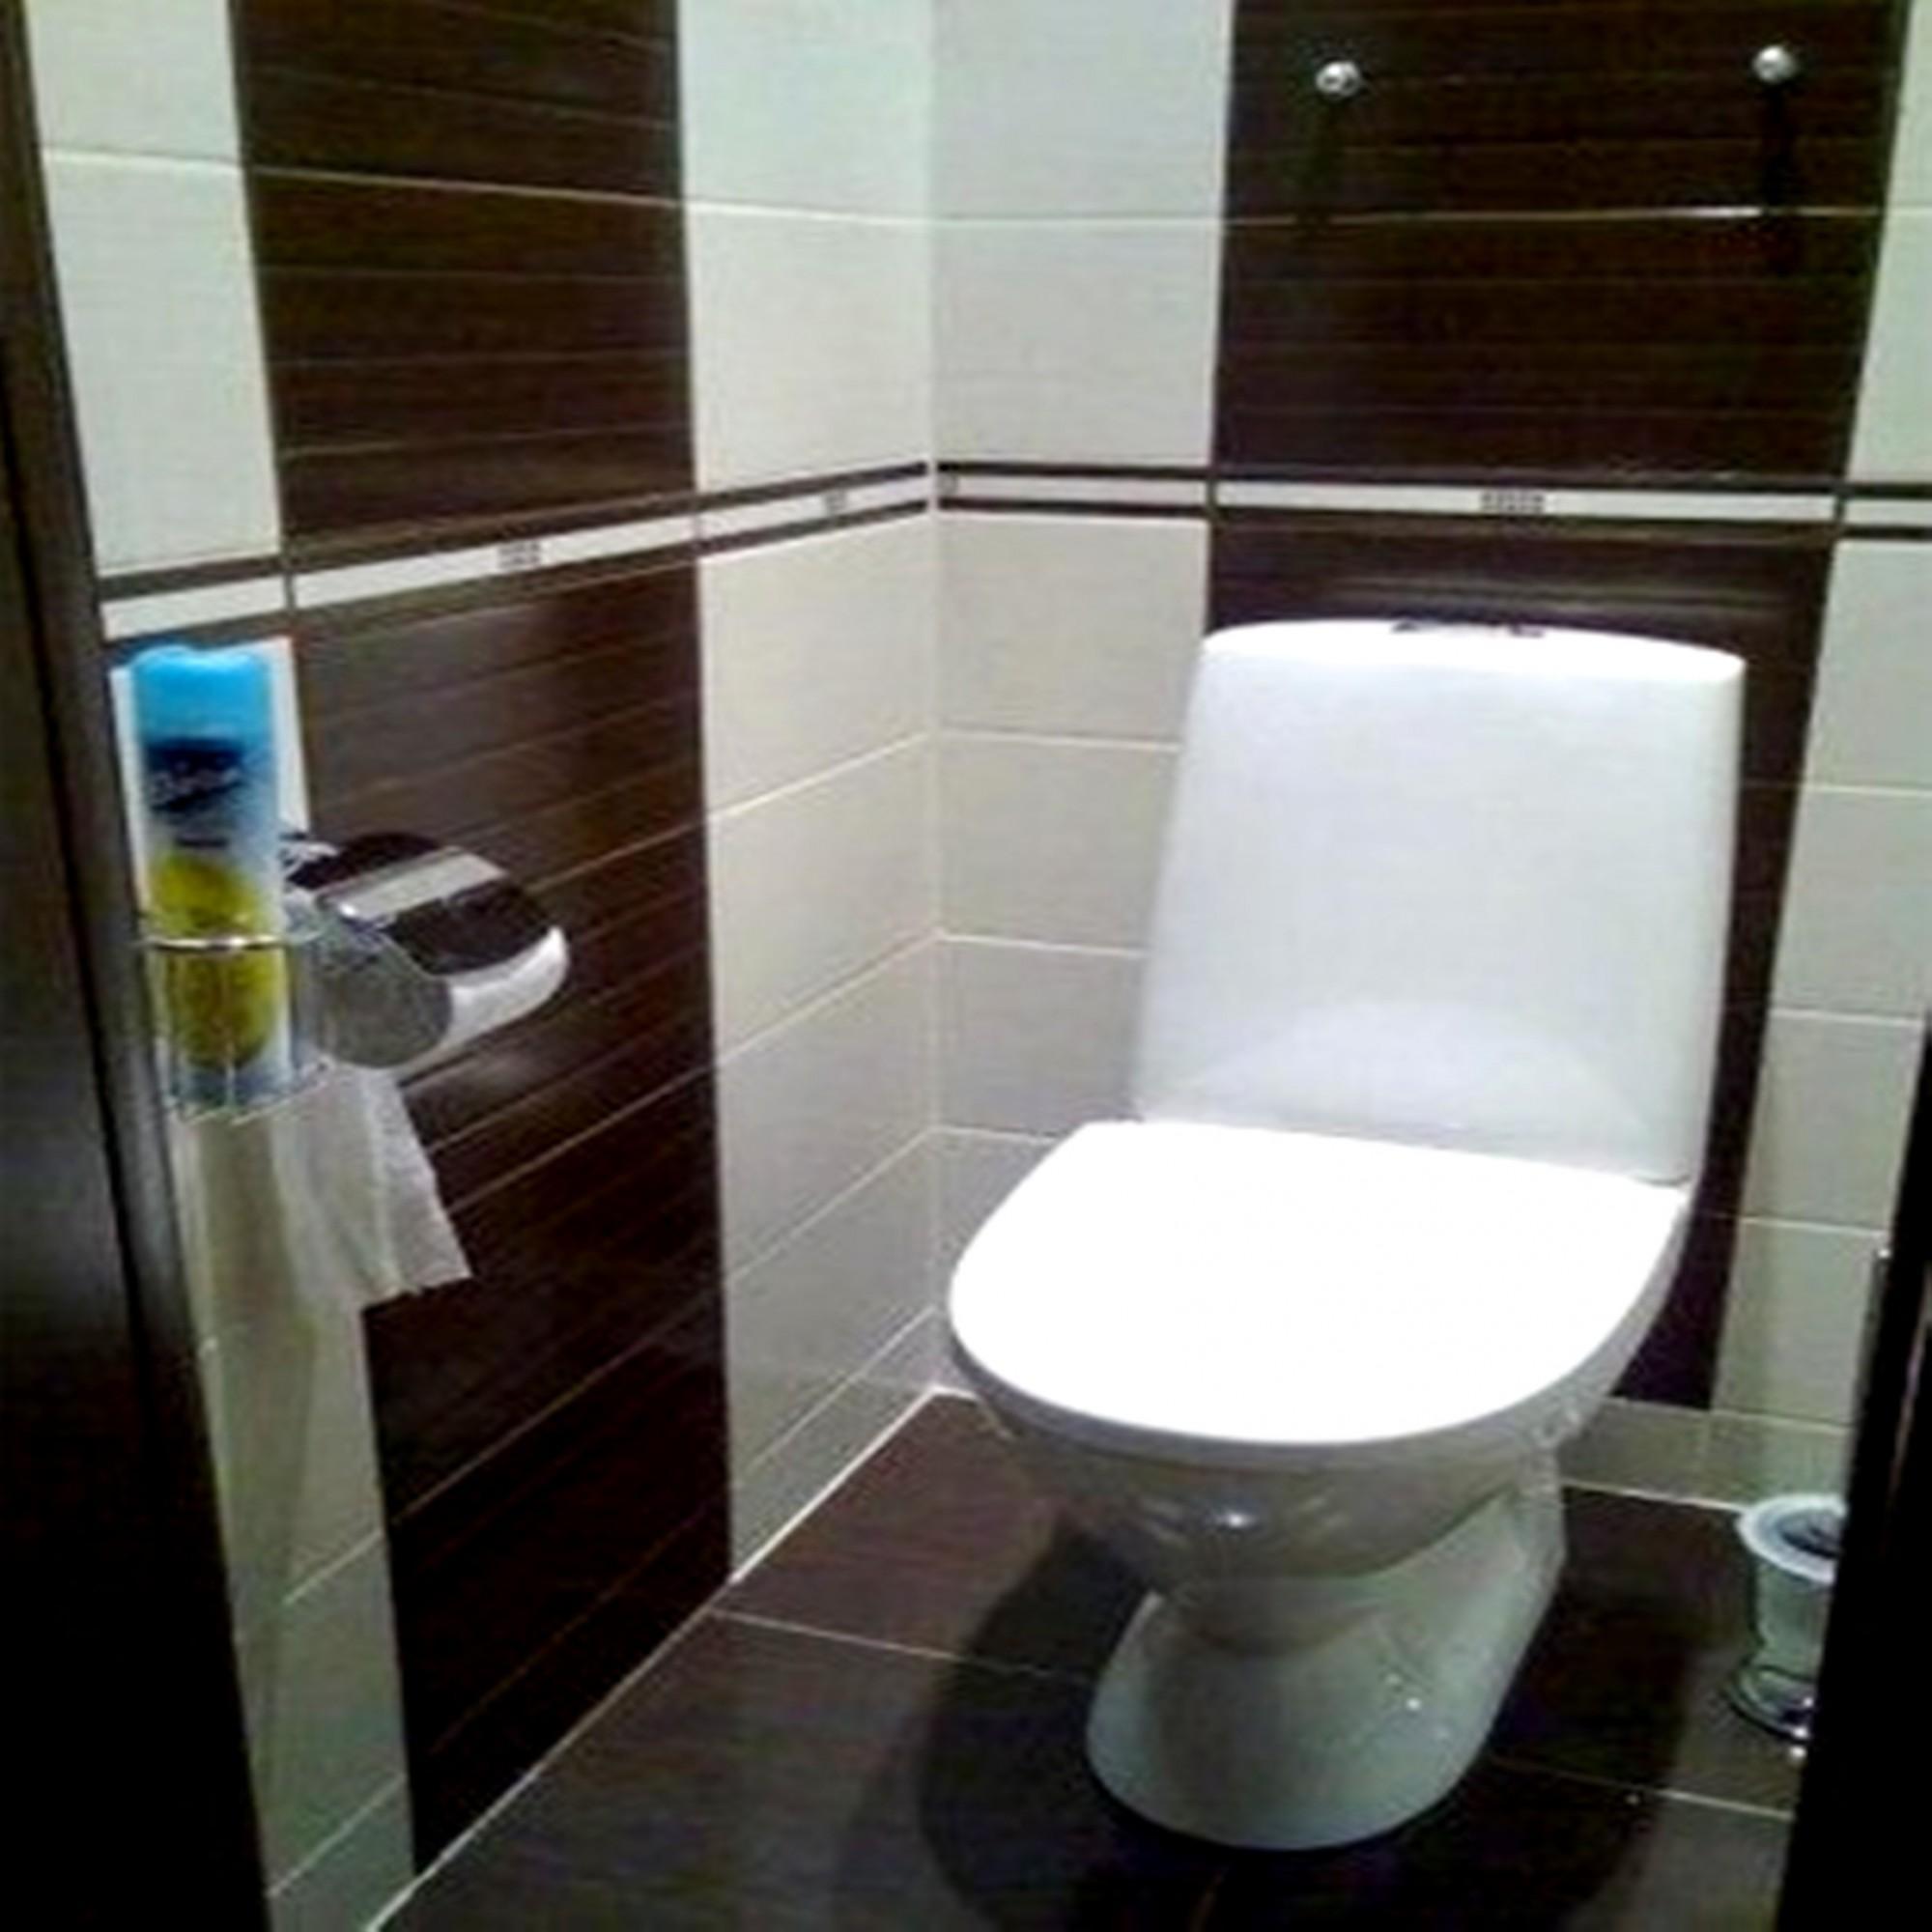 Туалет заслуживает уважения с давних ...: uhouse.ru/foto/3/25/2666/14174-tualet.html